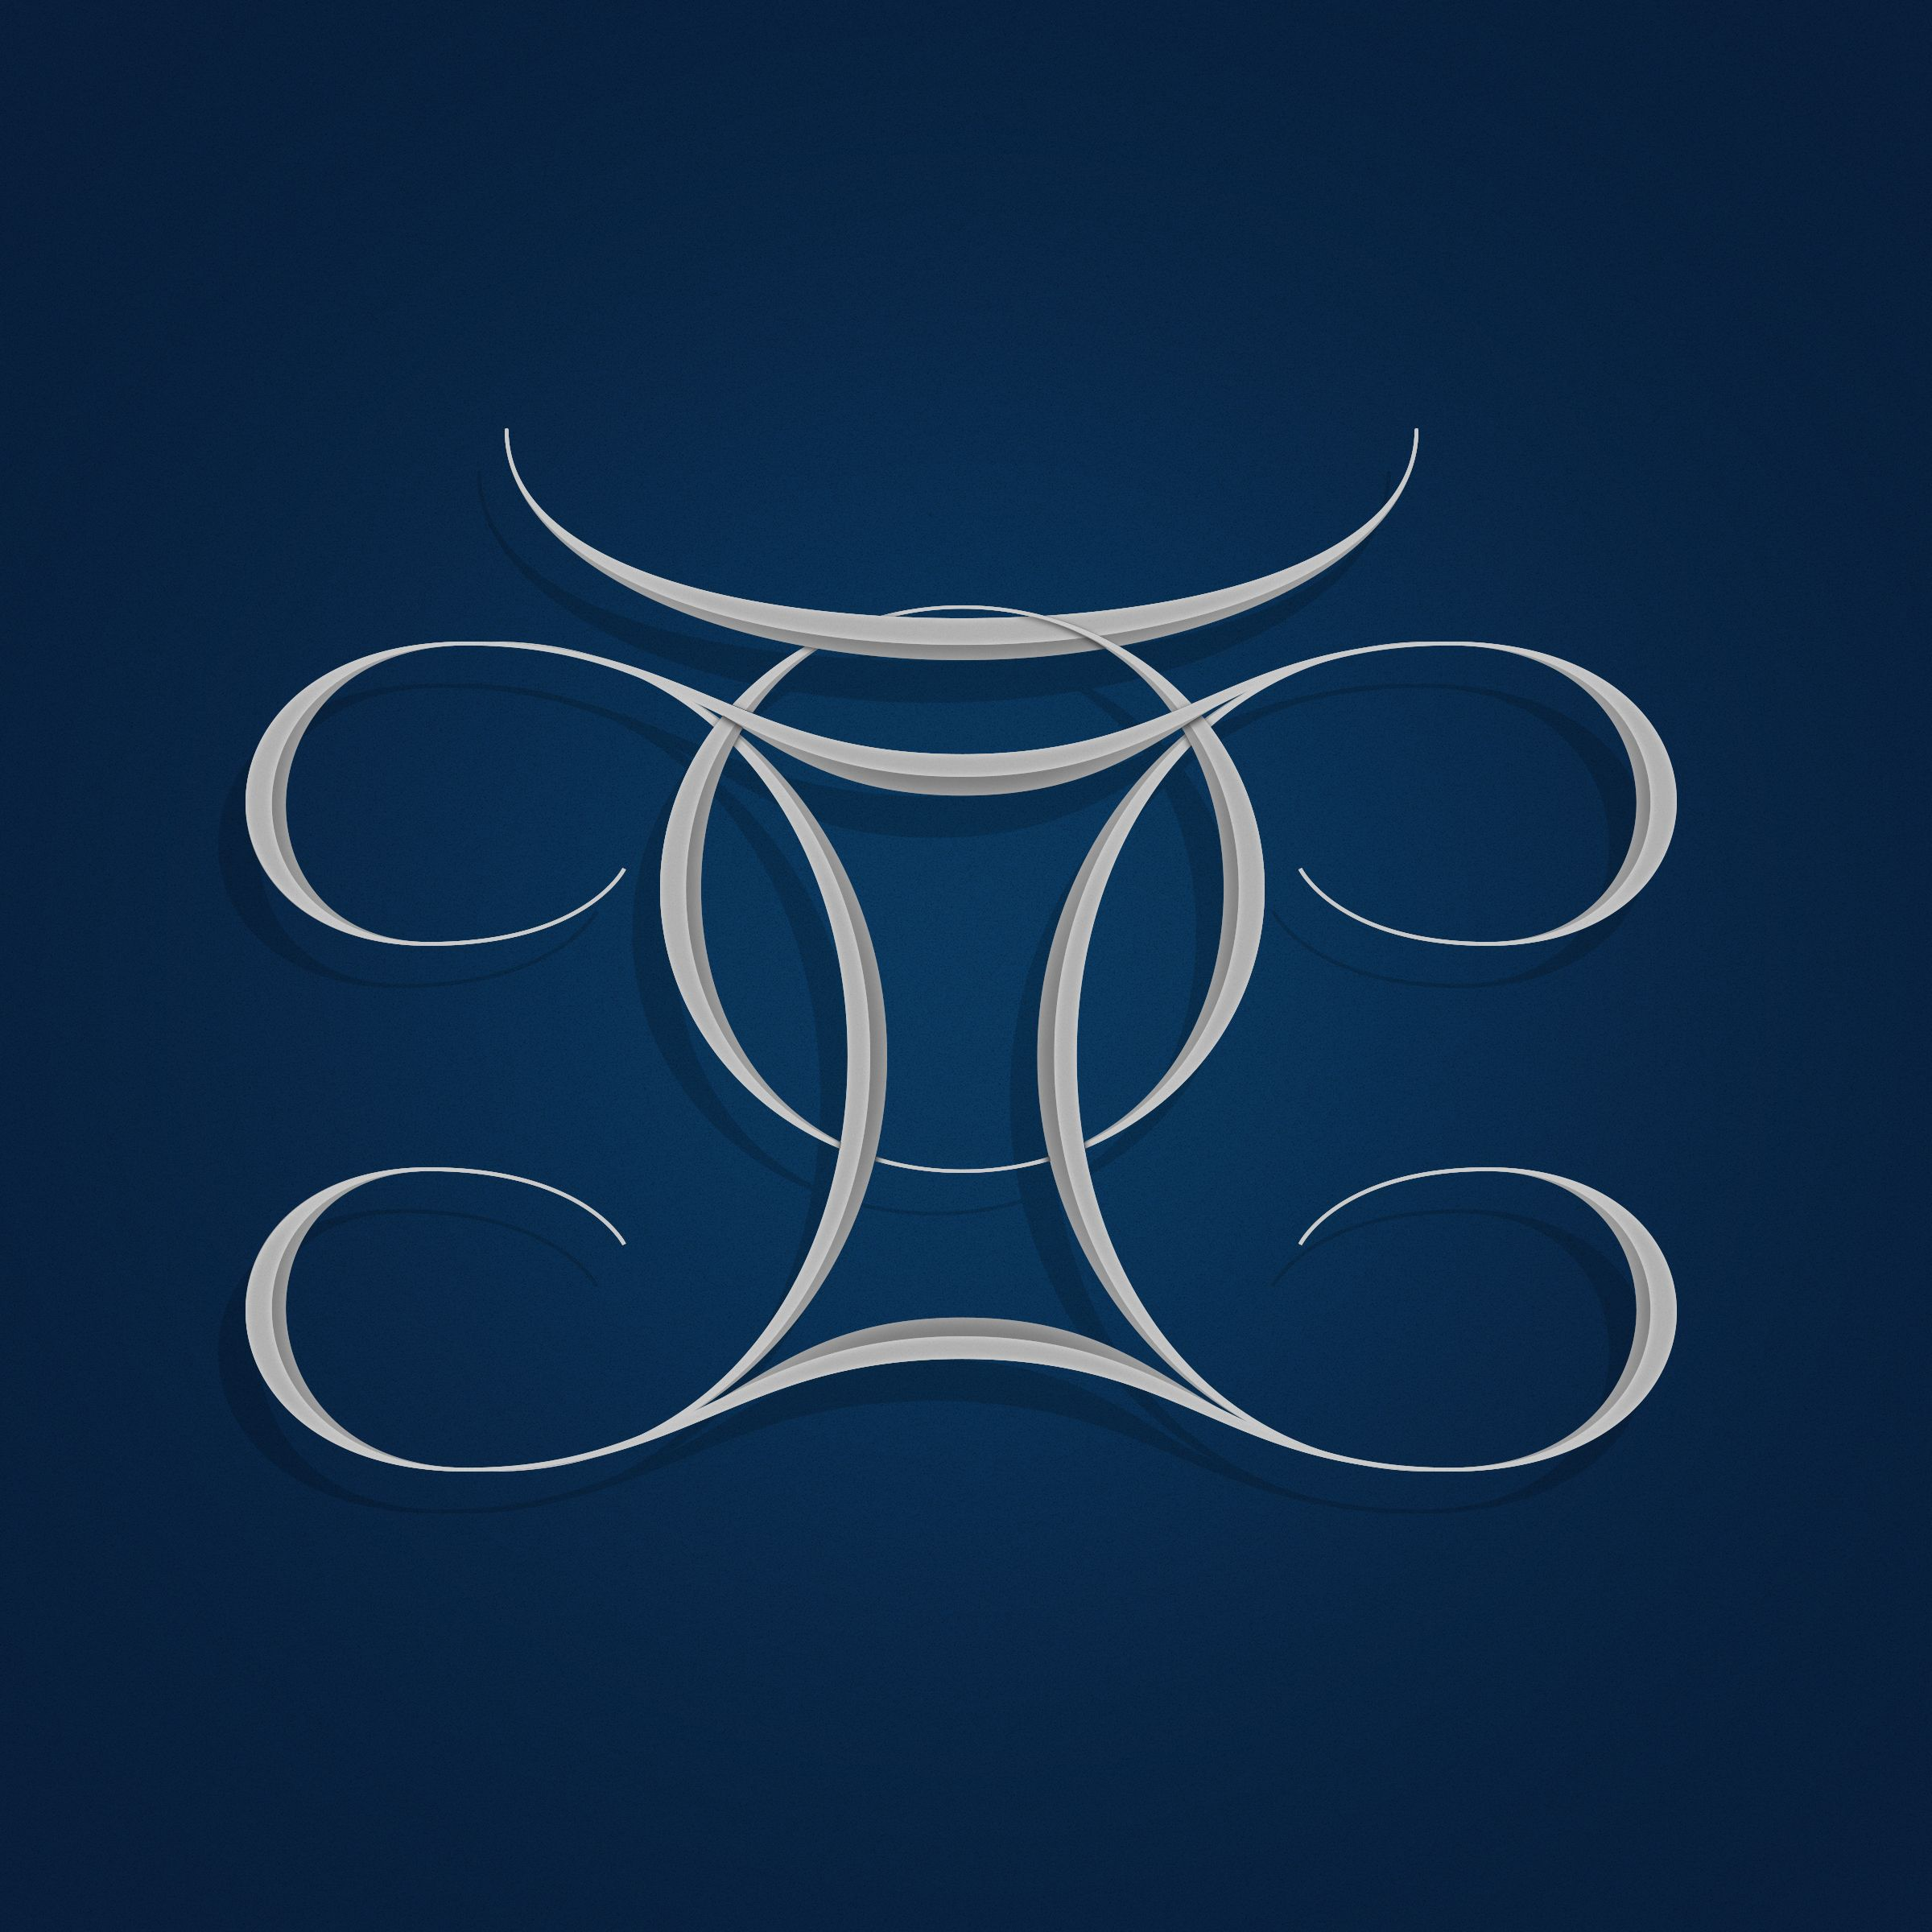 Taurus gemini symbols combined to one my hand lettering and taurus gemini symbols combined to one buycottarizona